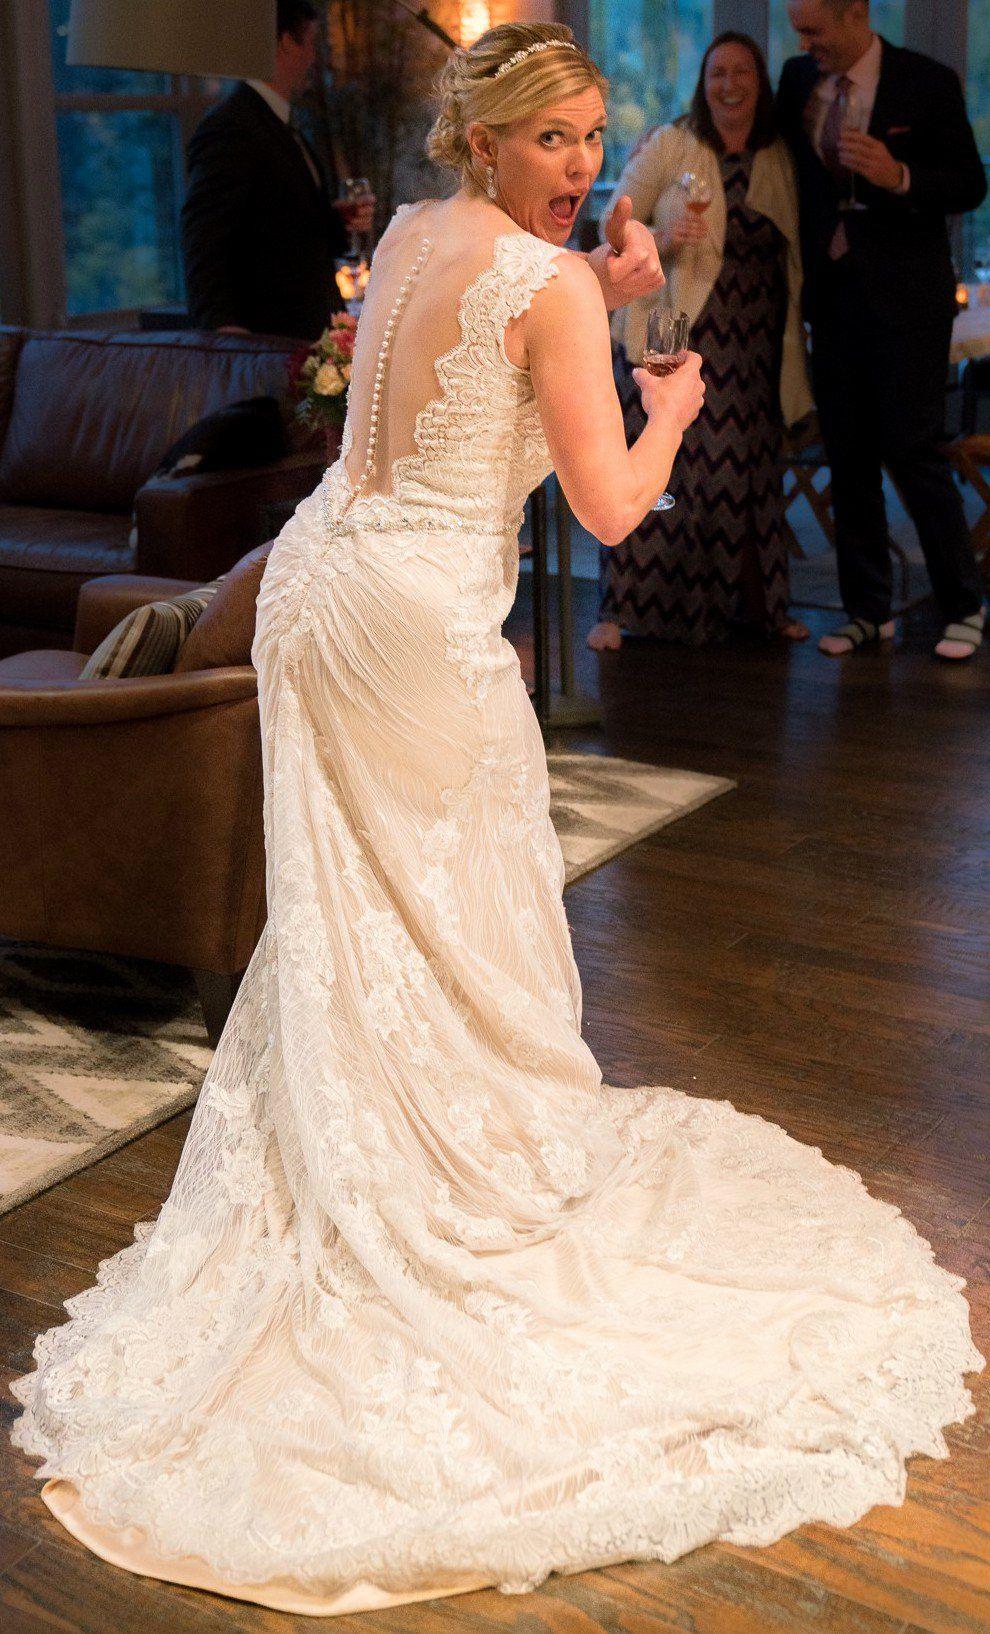 Wedding Dress Dry Cleaning Denver In 2020 Wedding Dresses Wedding Dress Alterations Dress Alterations